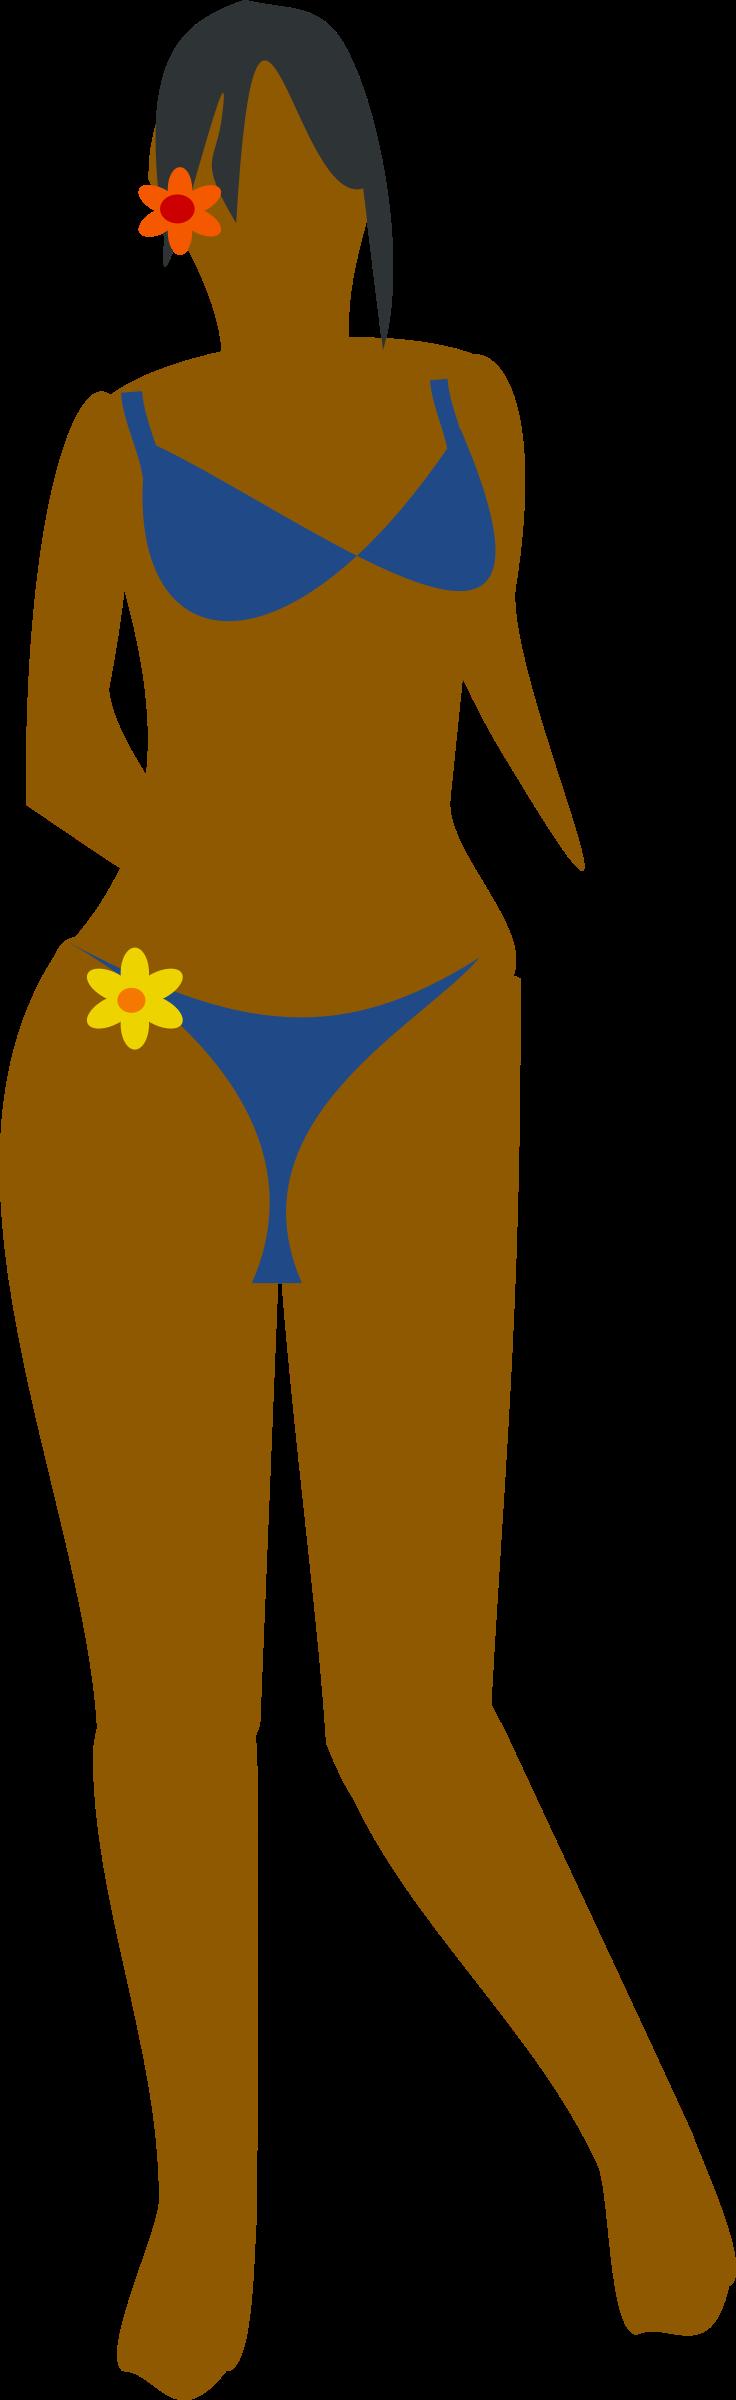 . Sunny clipart woman